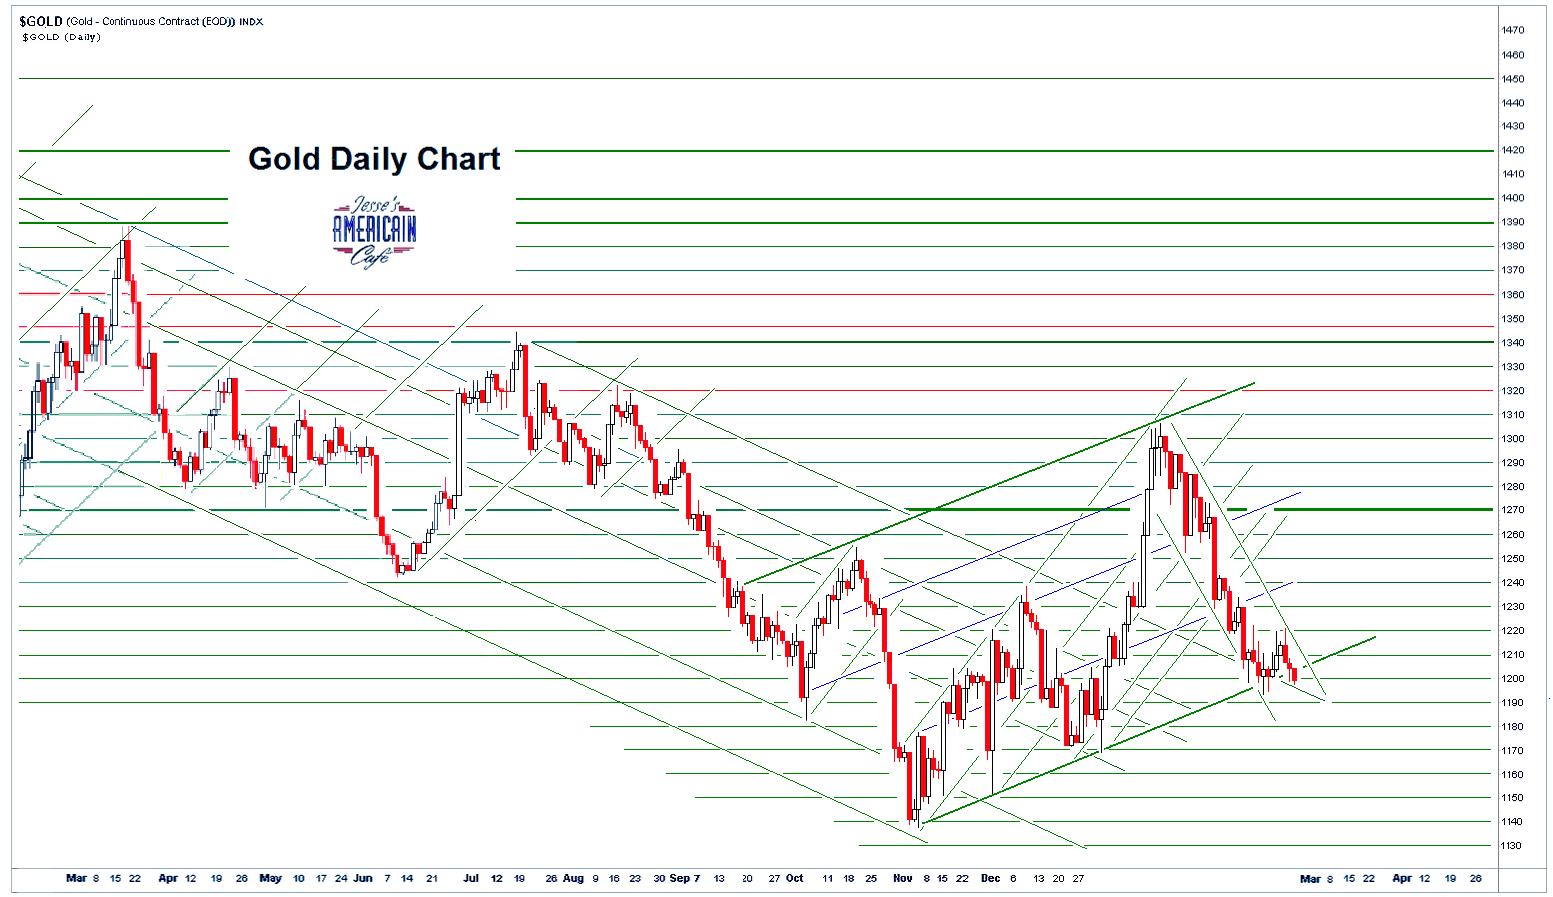 Bdo forex today графический анализ eur/jpy форекс 29.06.10